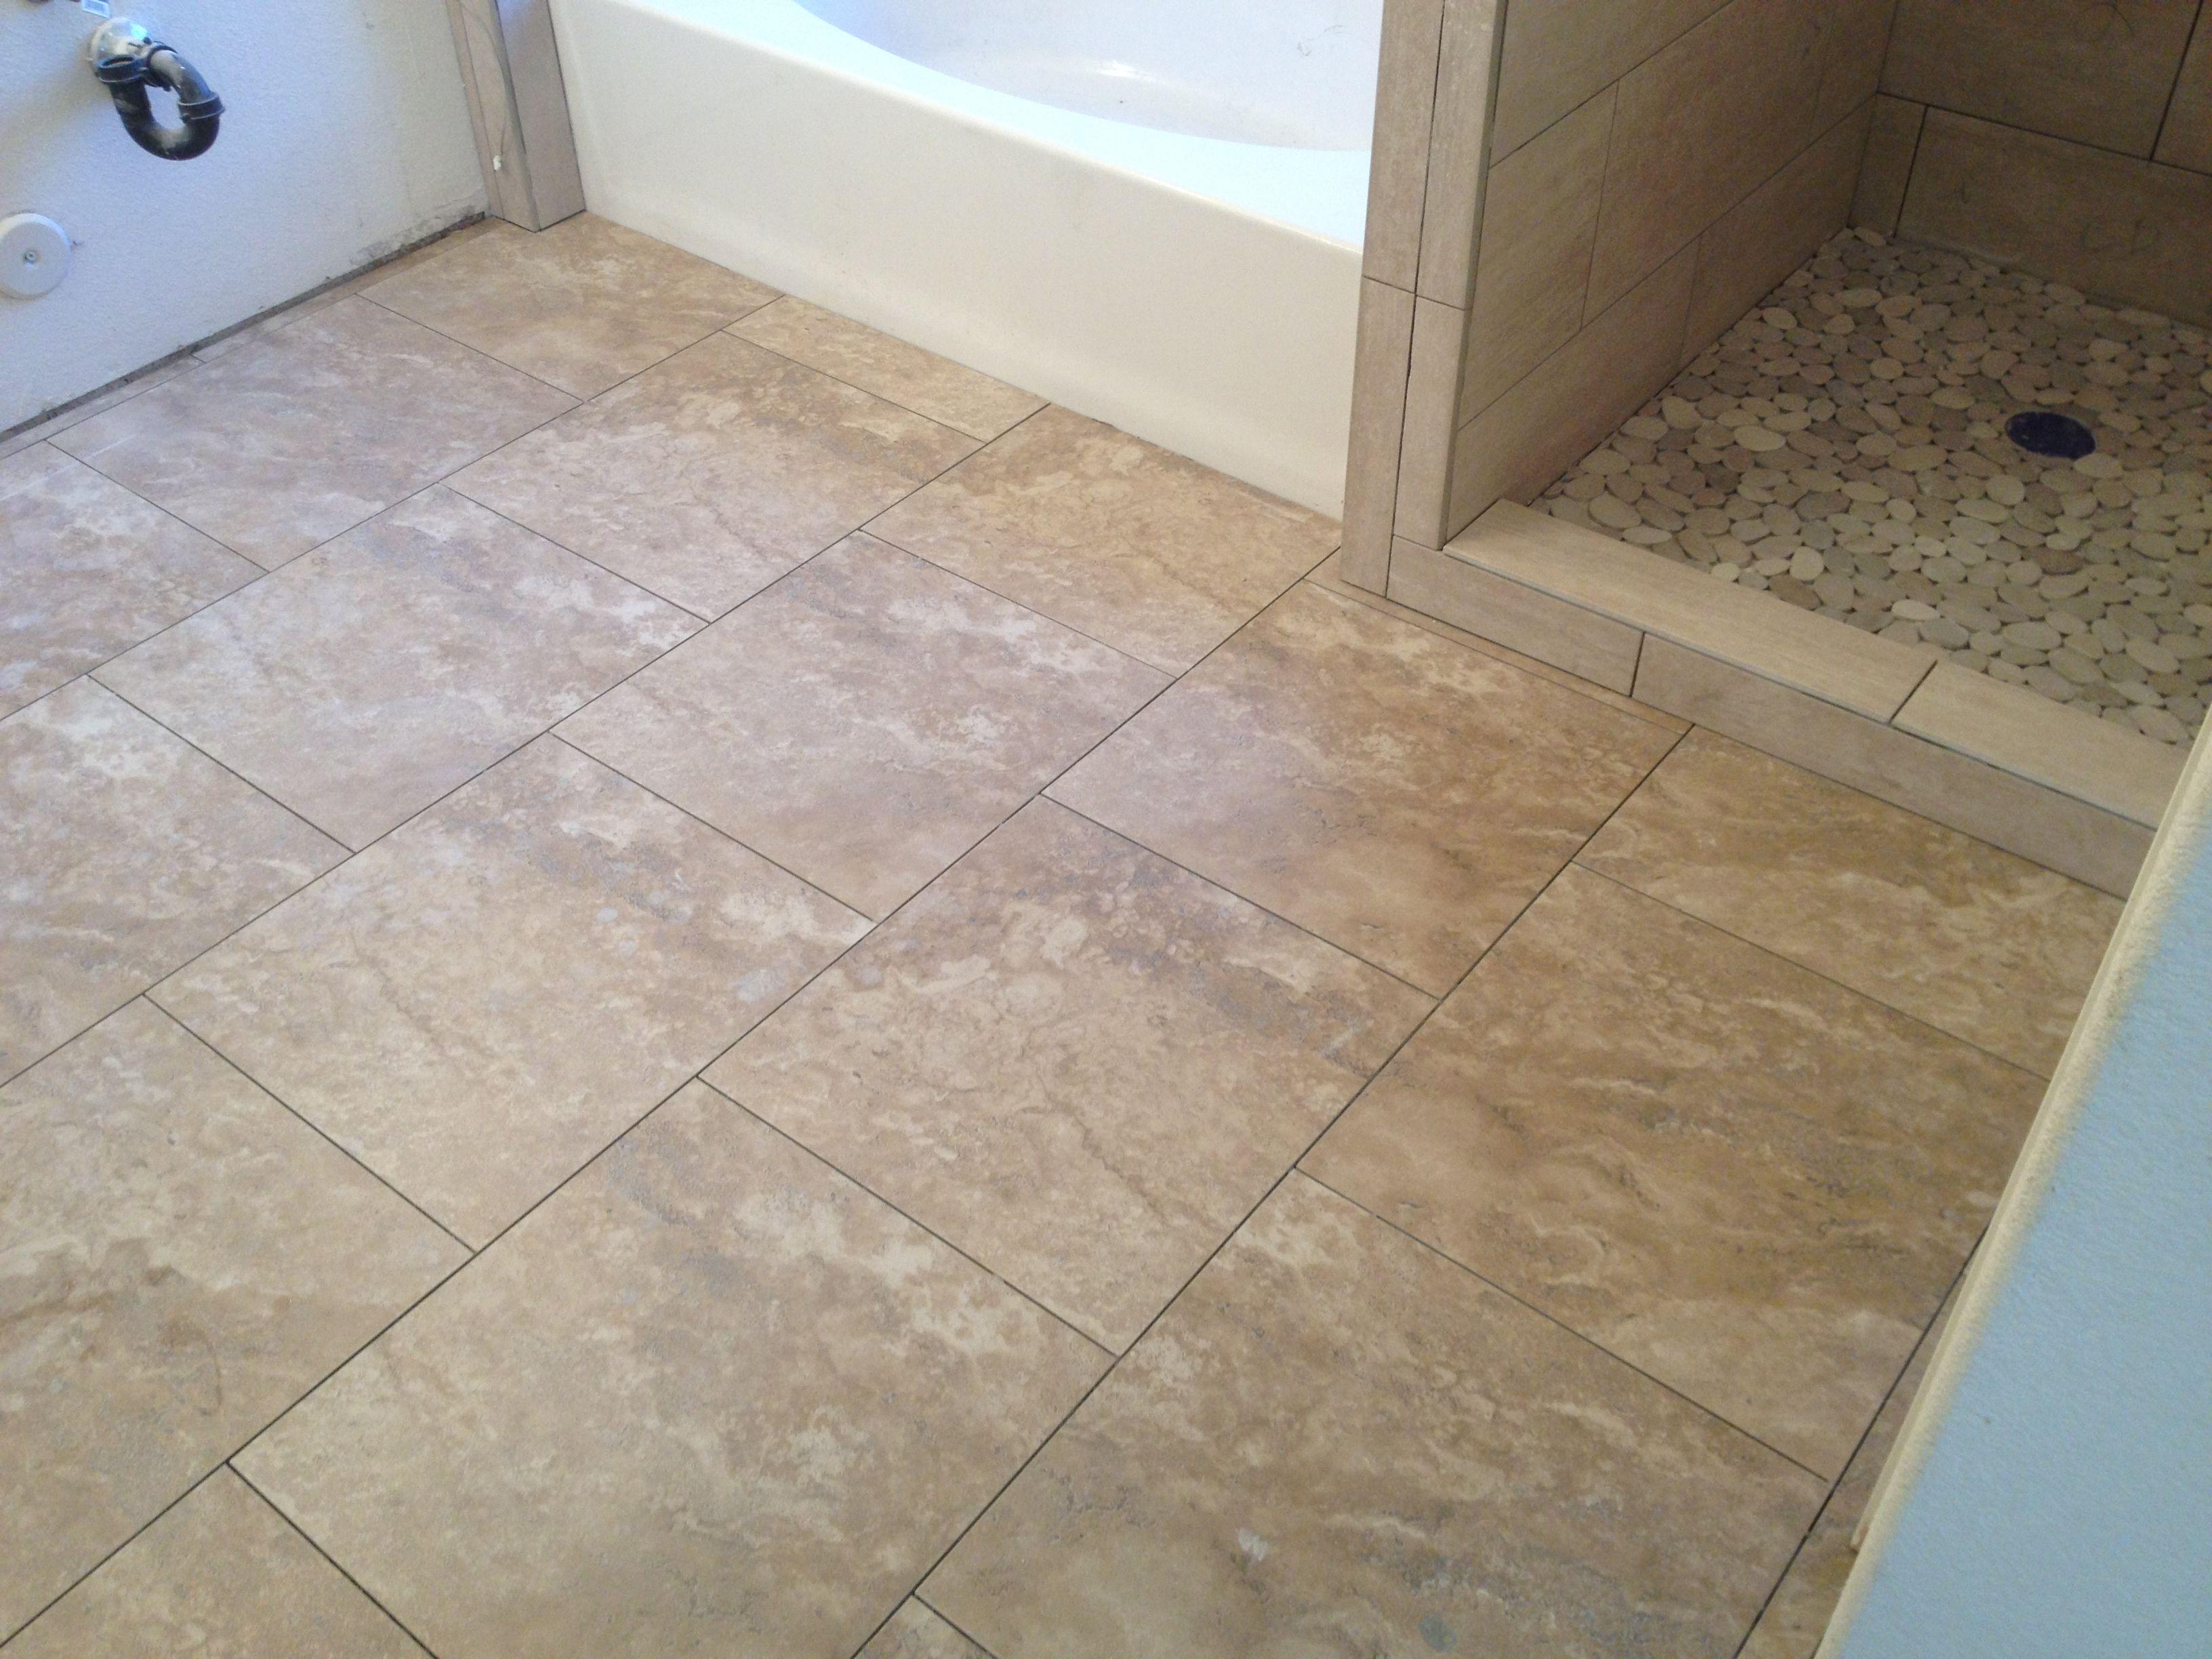 20 X 20 Ceramic In Brick Lay Pattern Tile Floor Floor Tile